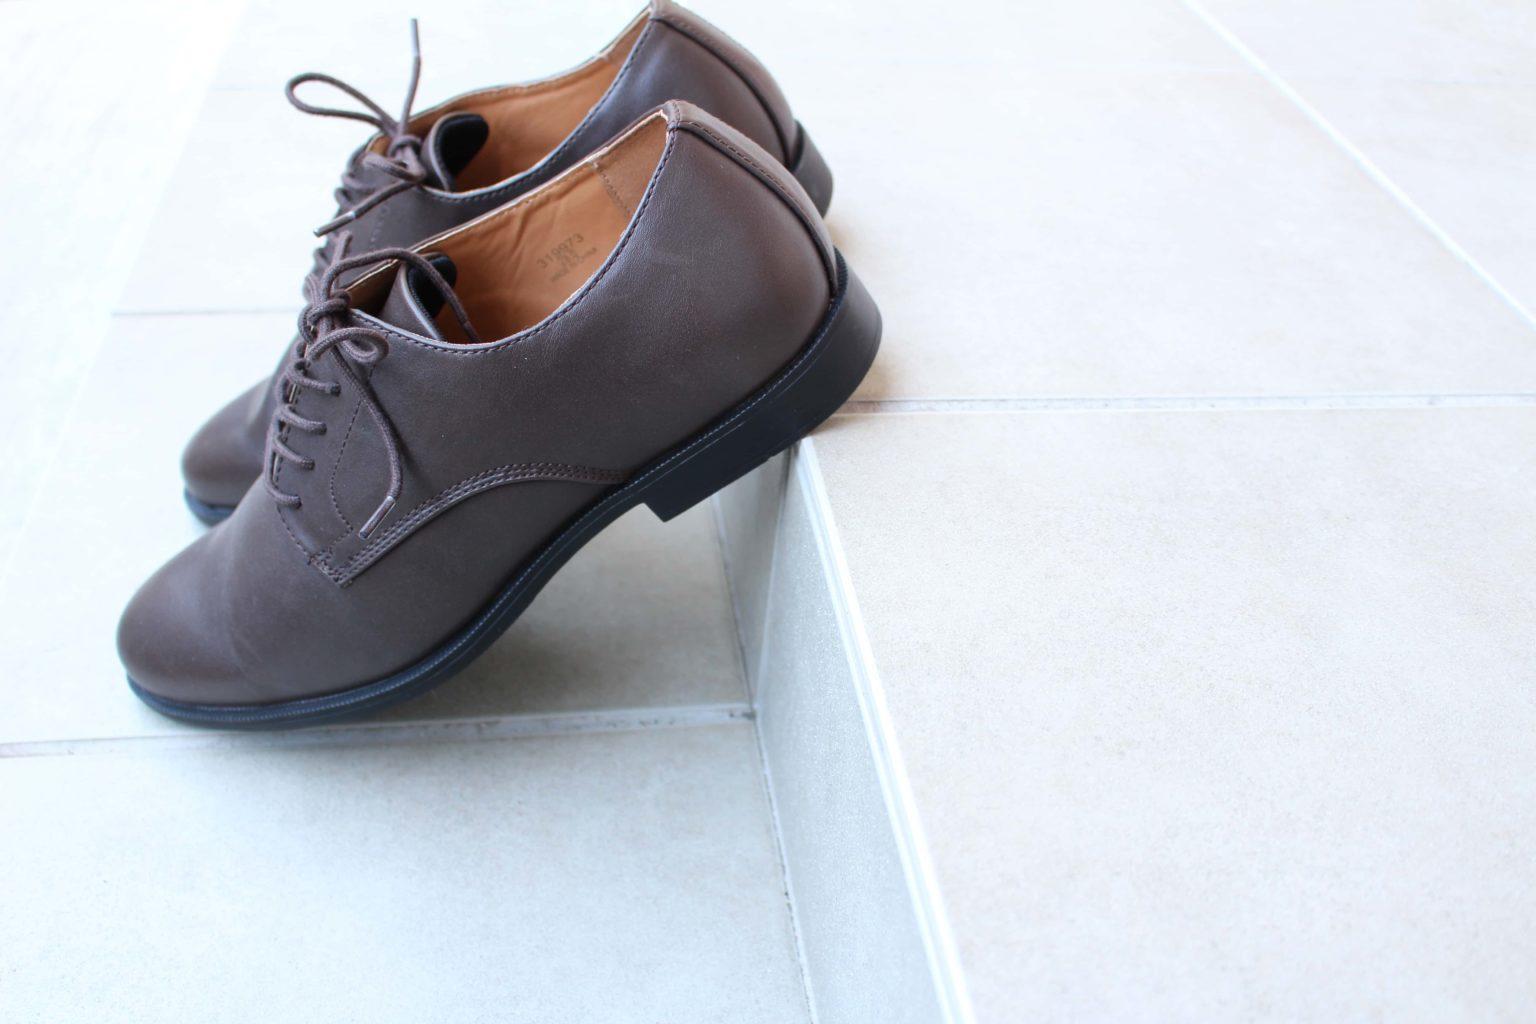 GU 革靴 アクティブスマートダービーシューズ ビジネスシューズ 合皮 ジーユー シューズ 靴